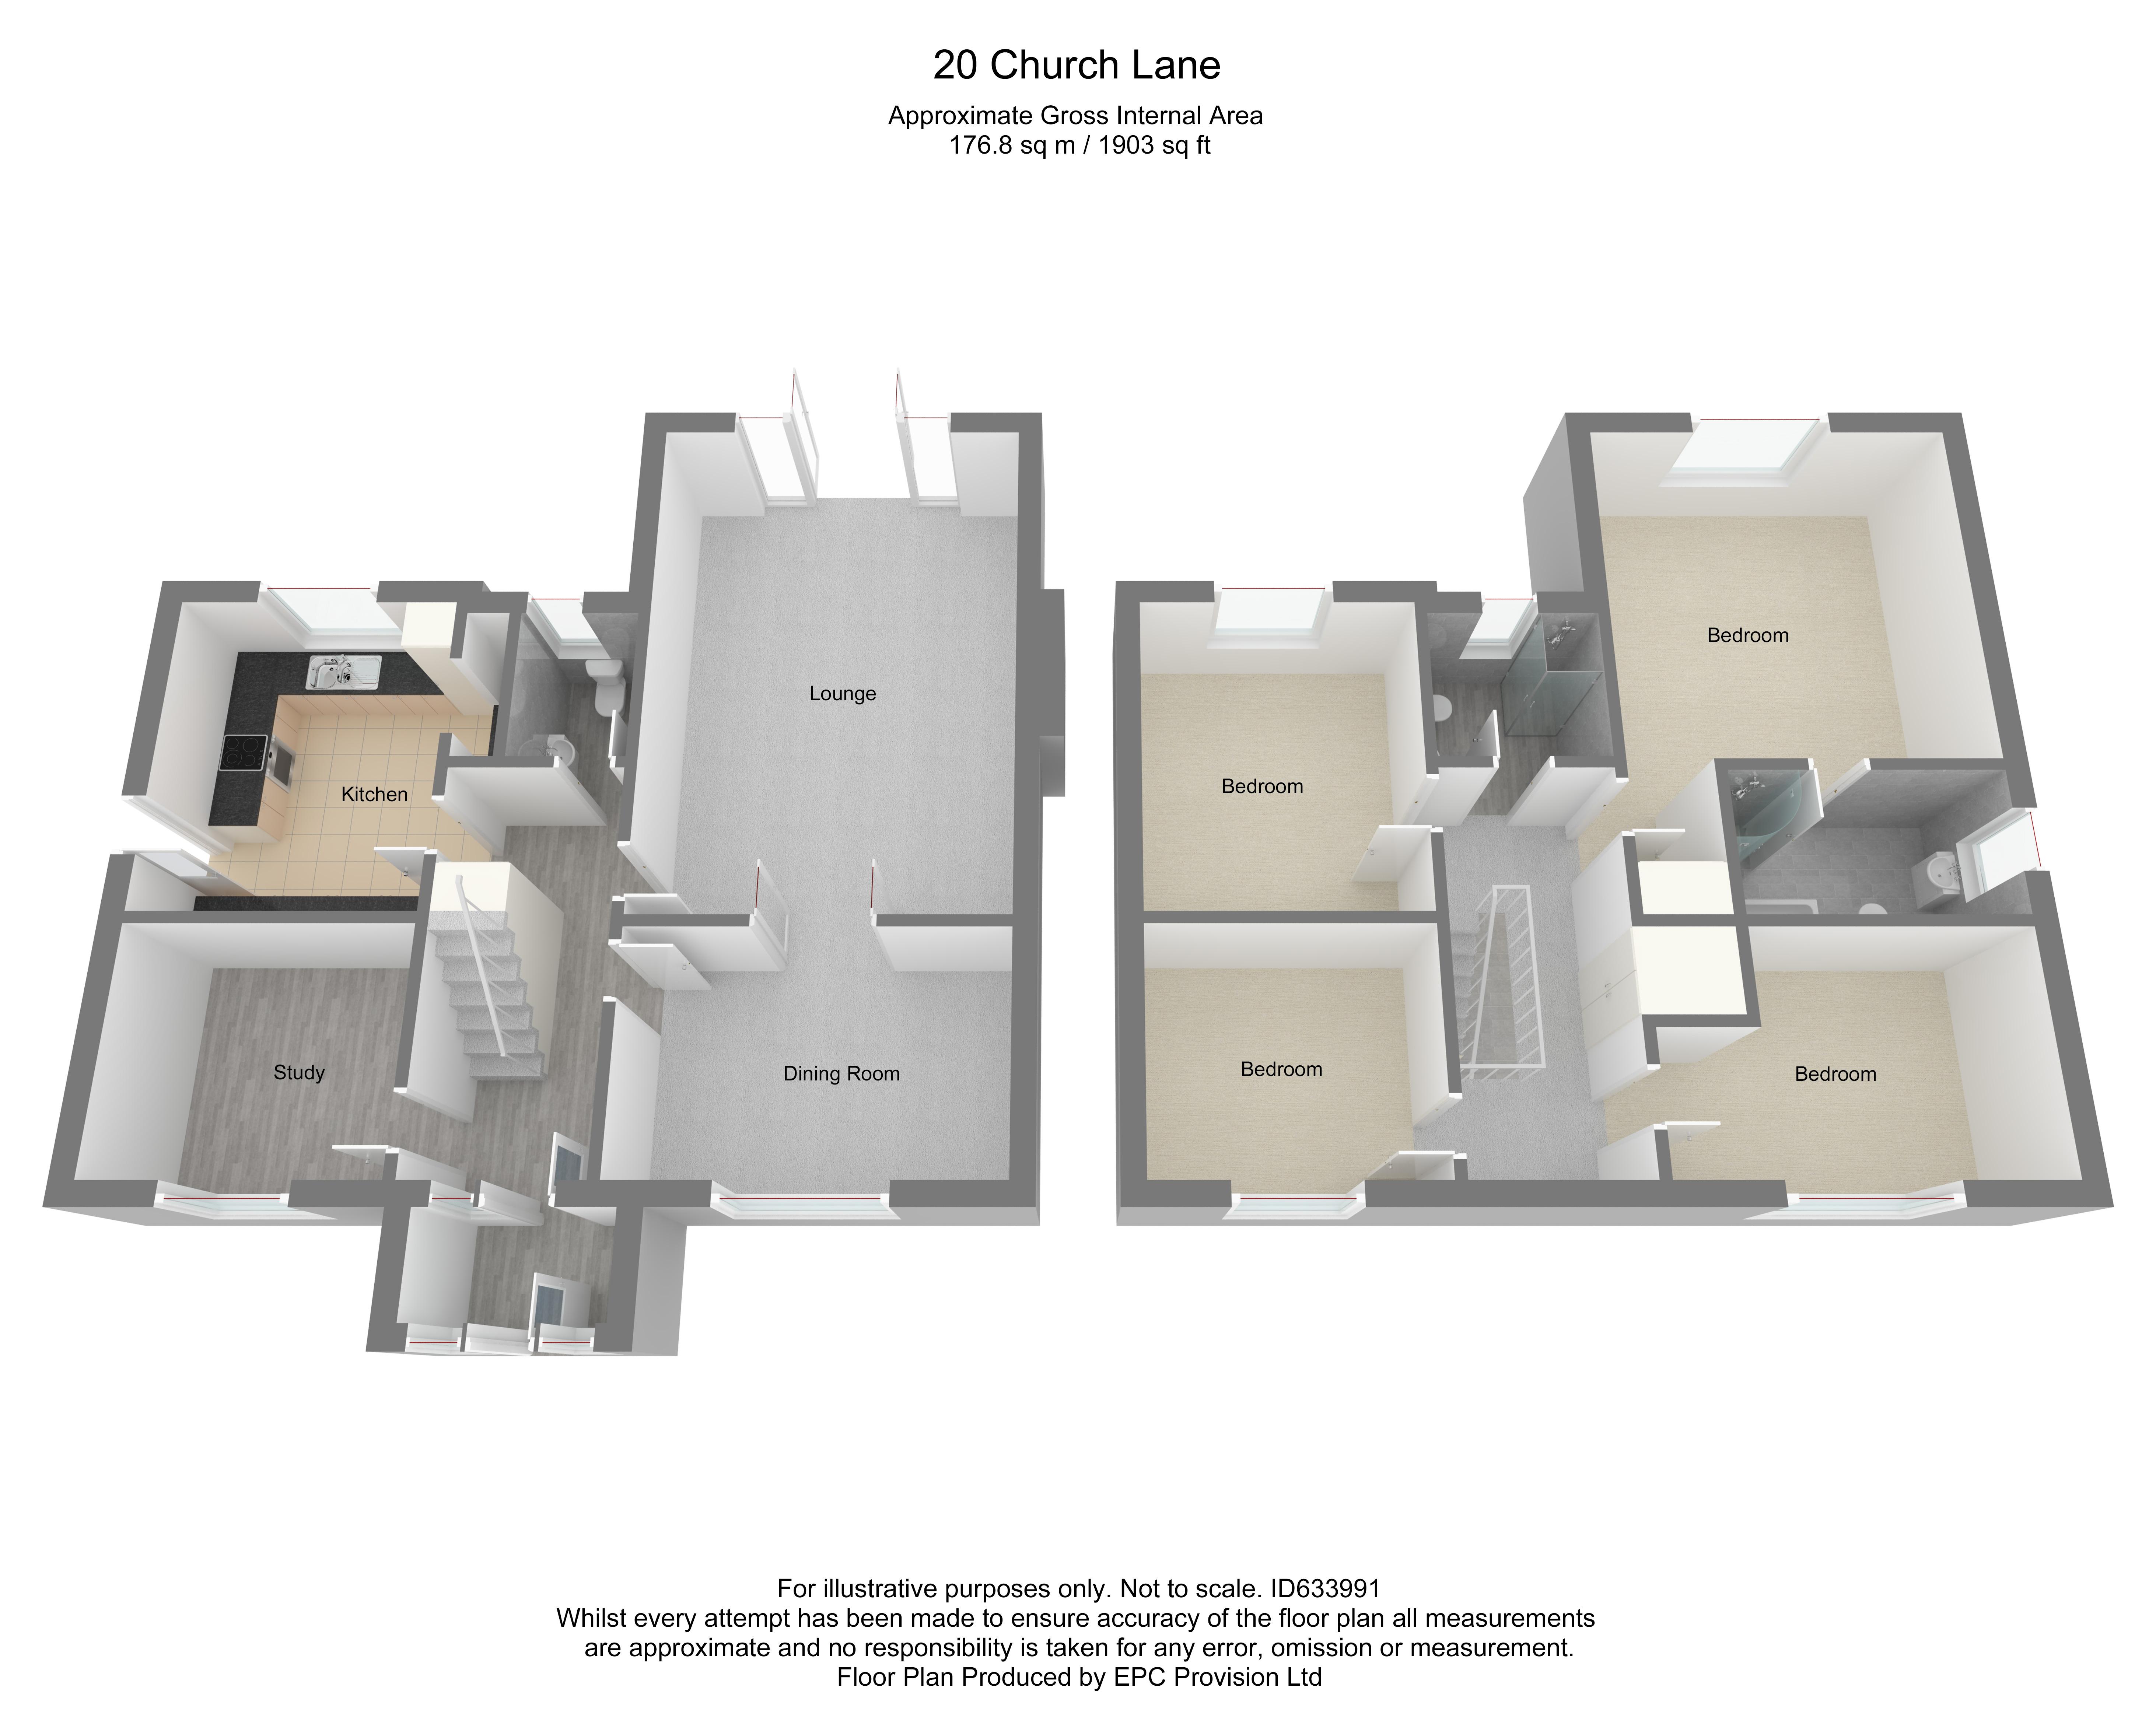 Floorplan for Church Lane, Coalpit Heath.